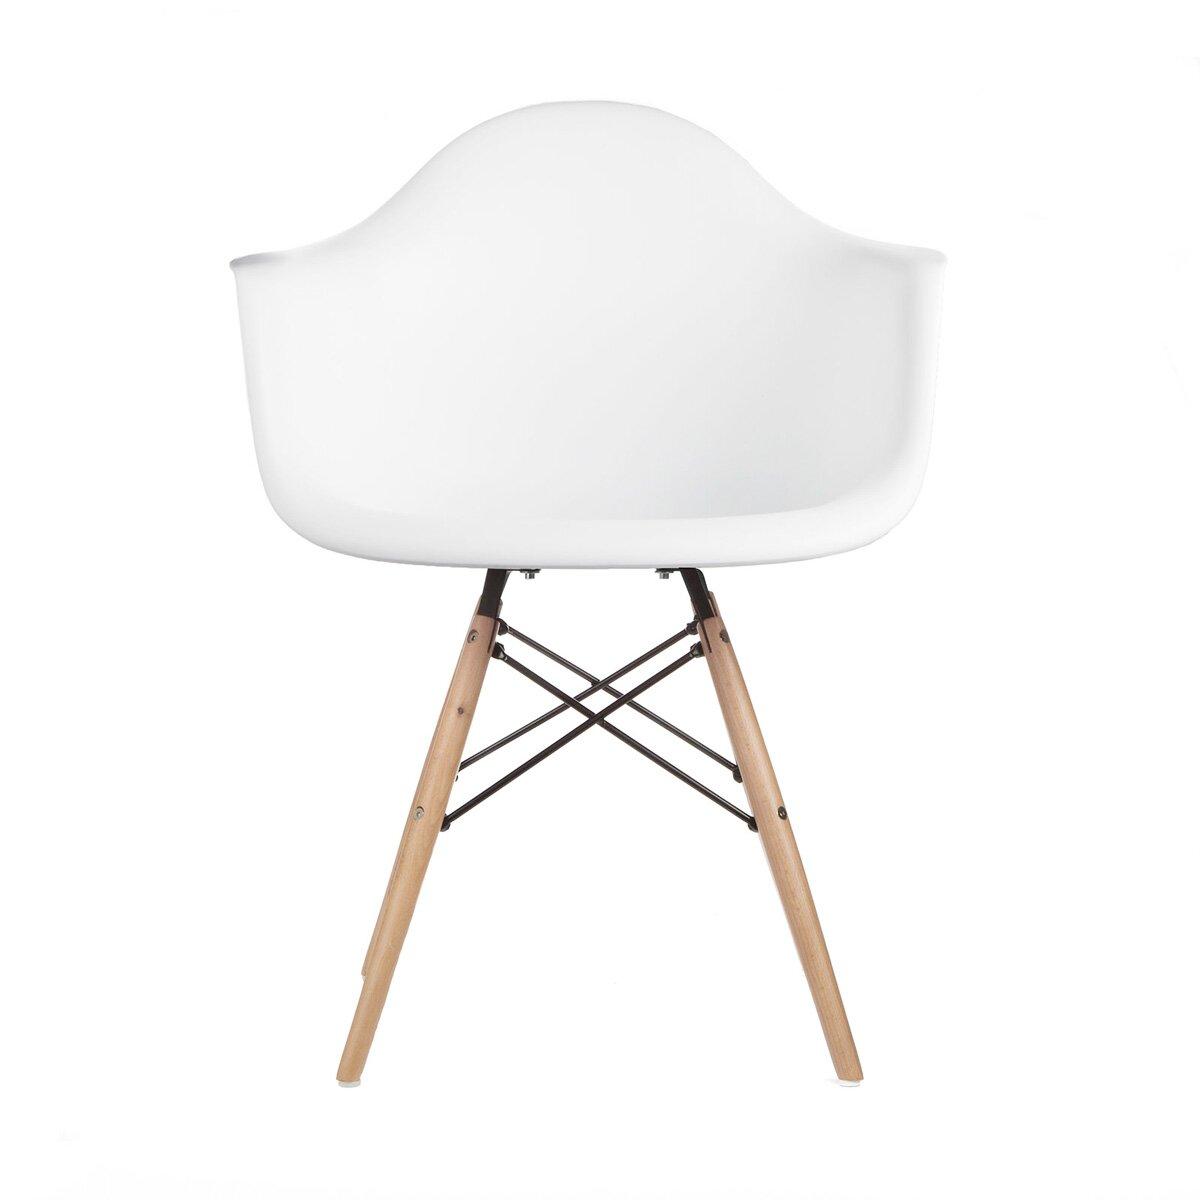 Emodern decor mid century modern scandinavian arm chair for Modern arm chair